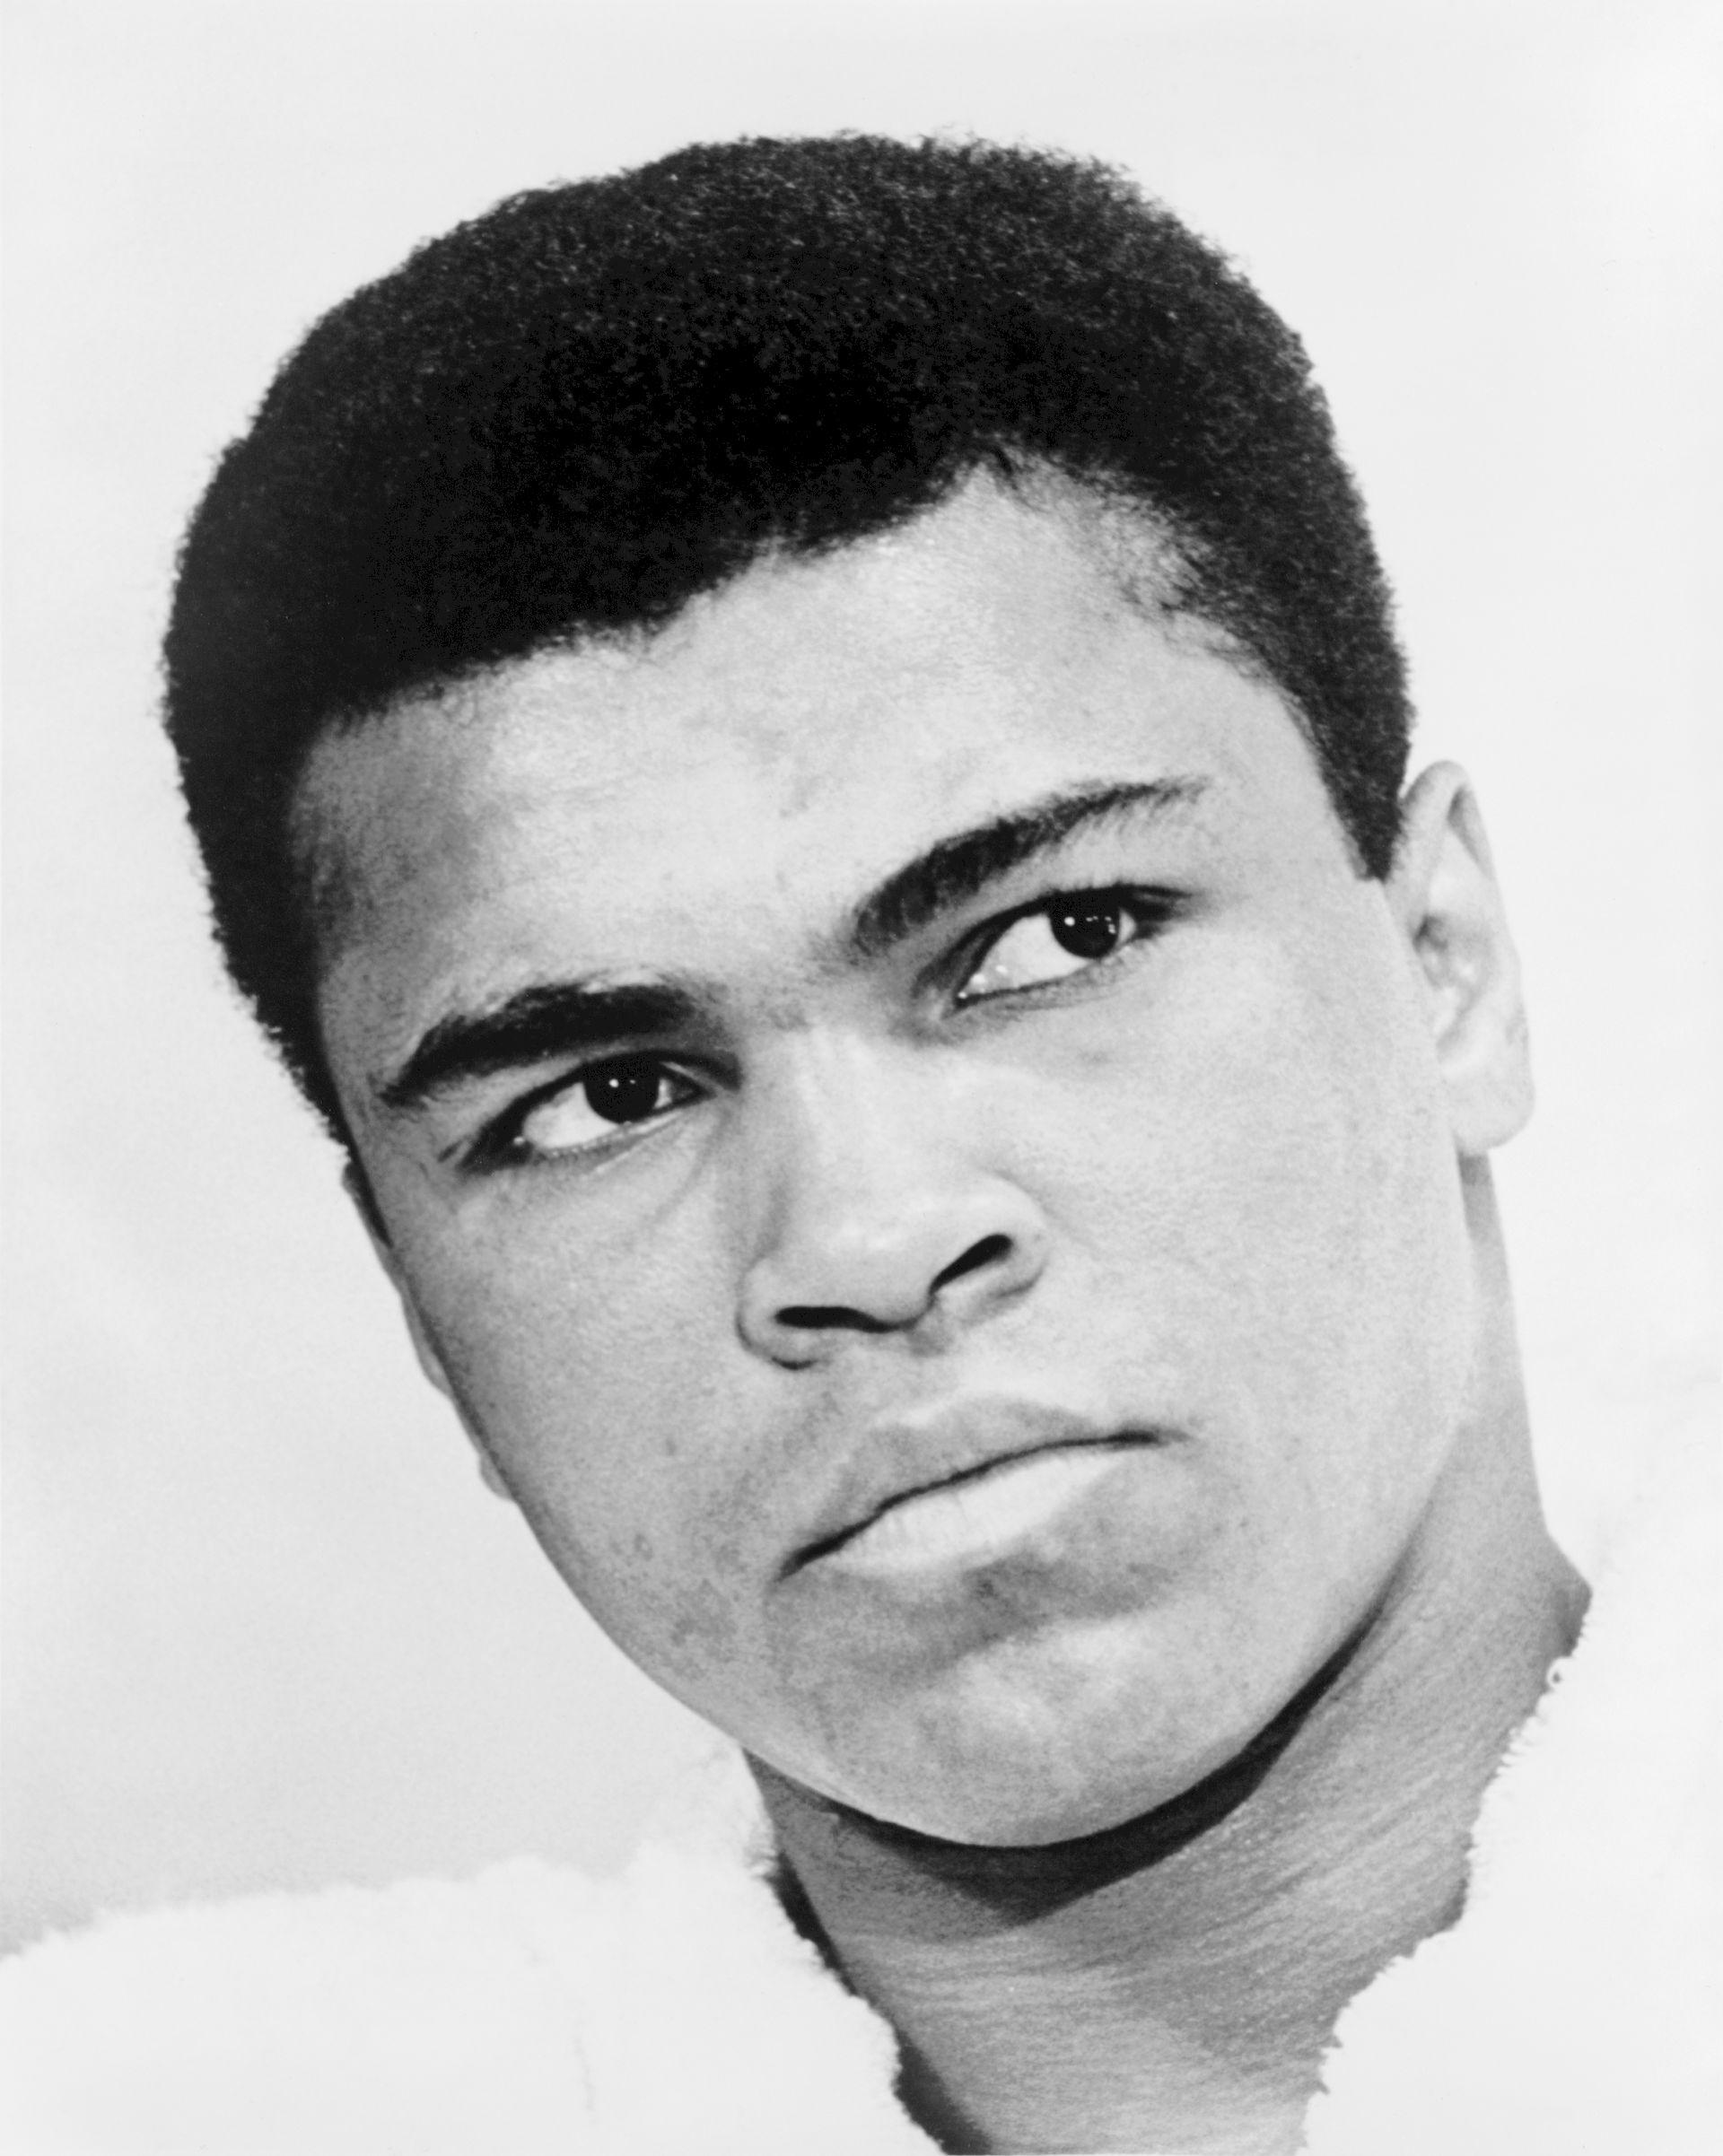 Photo of Muhammad Ali: African American boxer, philanthropist and activist